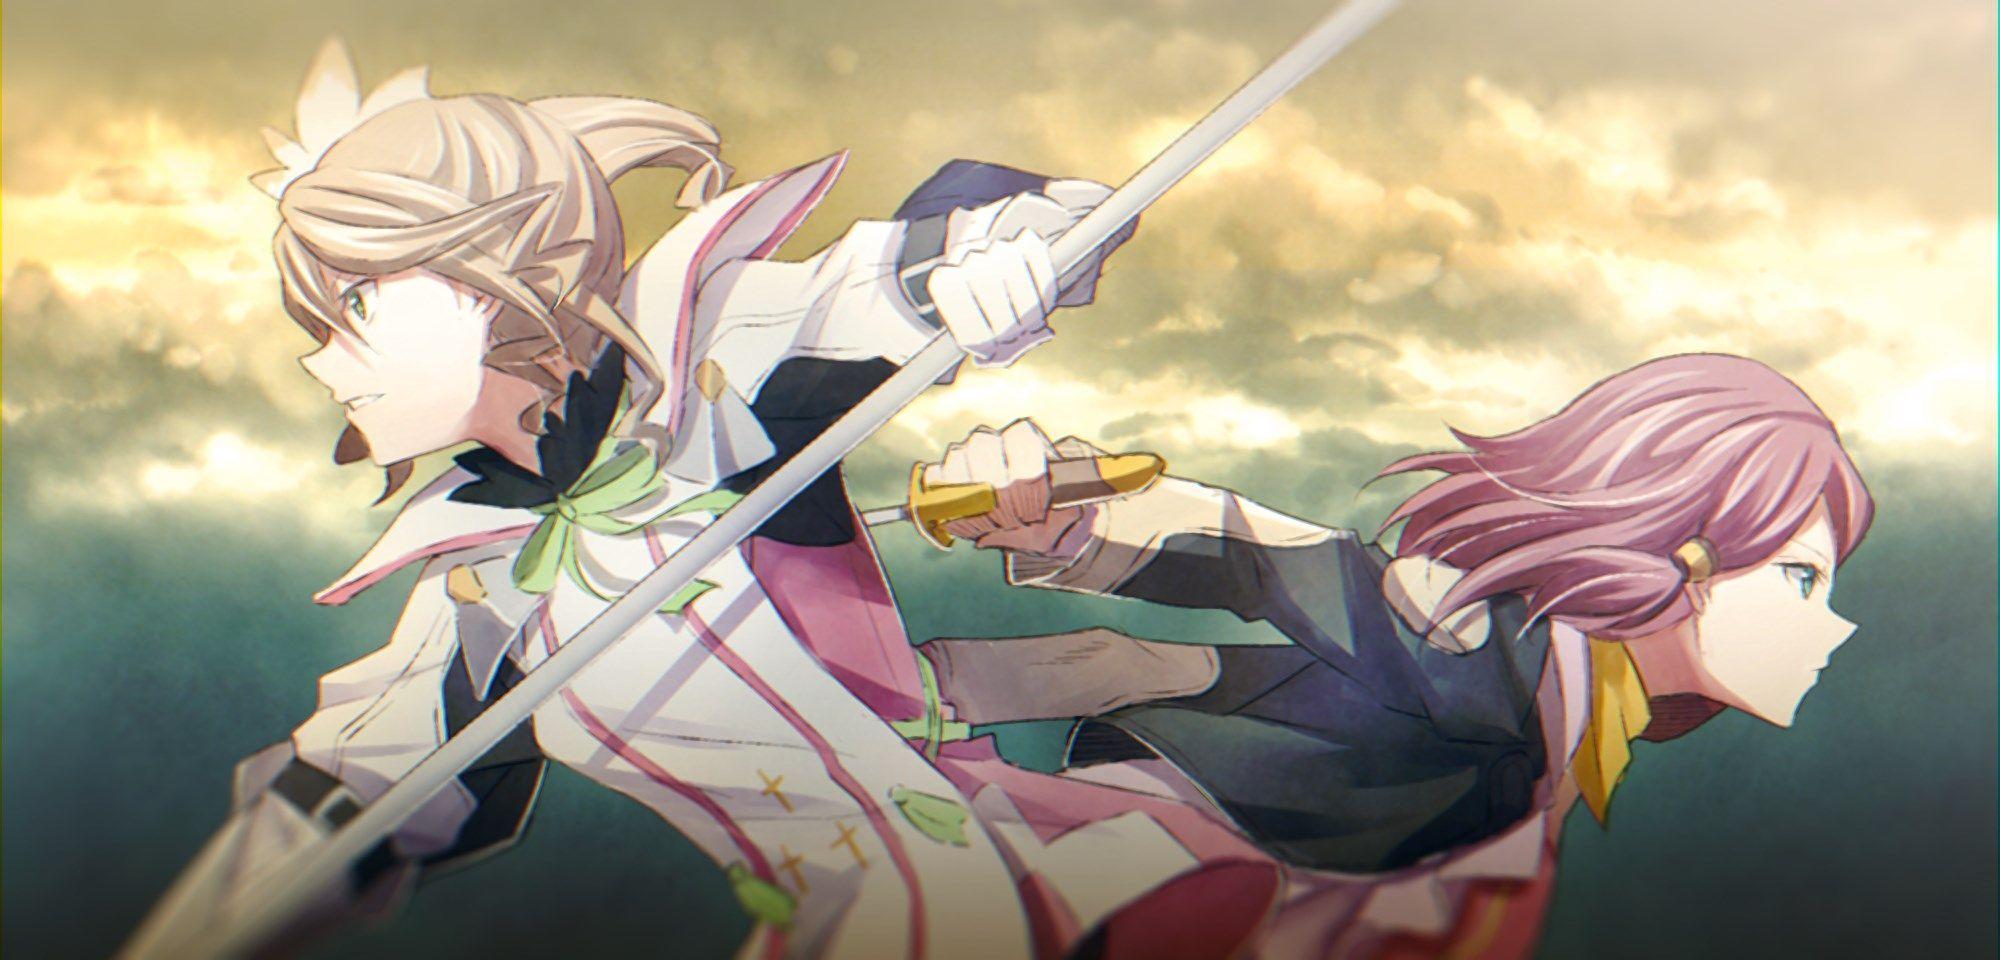 Tales Of Zestiria Anime Imagens Full Hd Arte De Paisagens